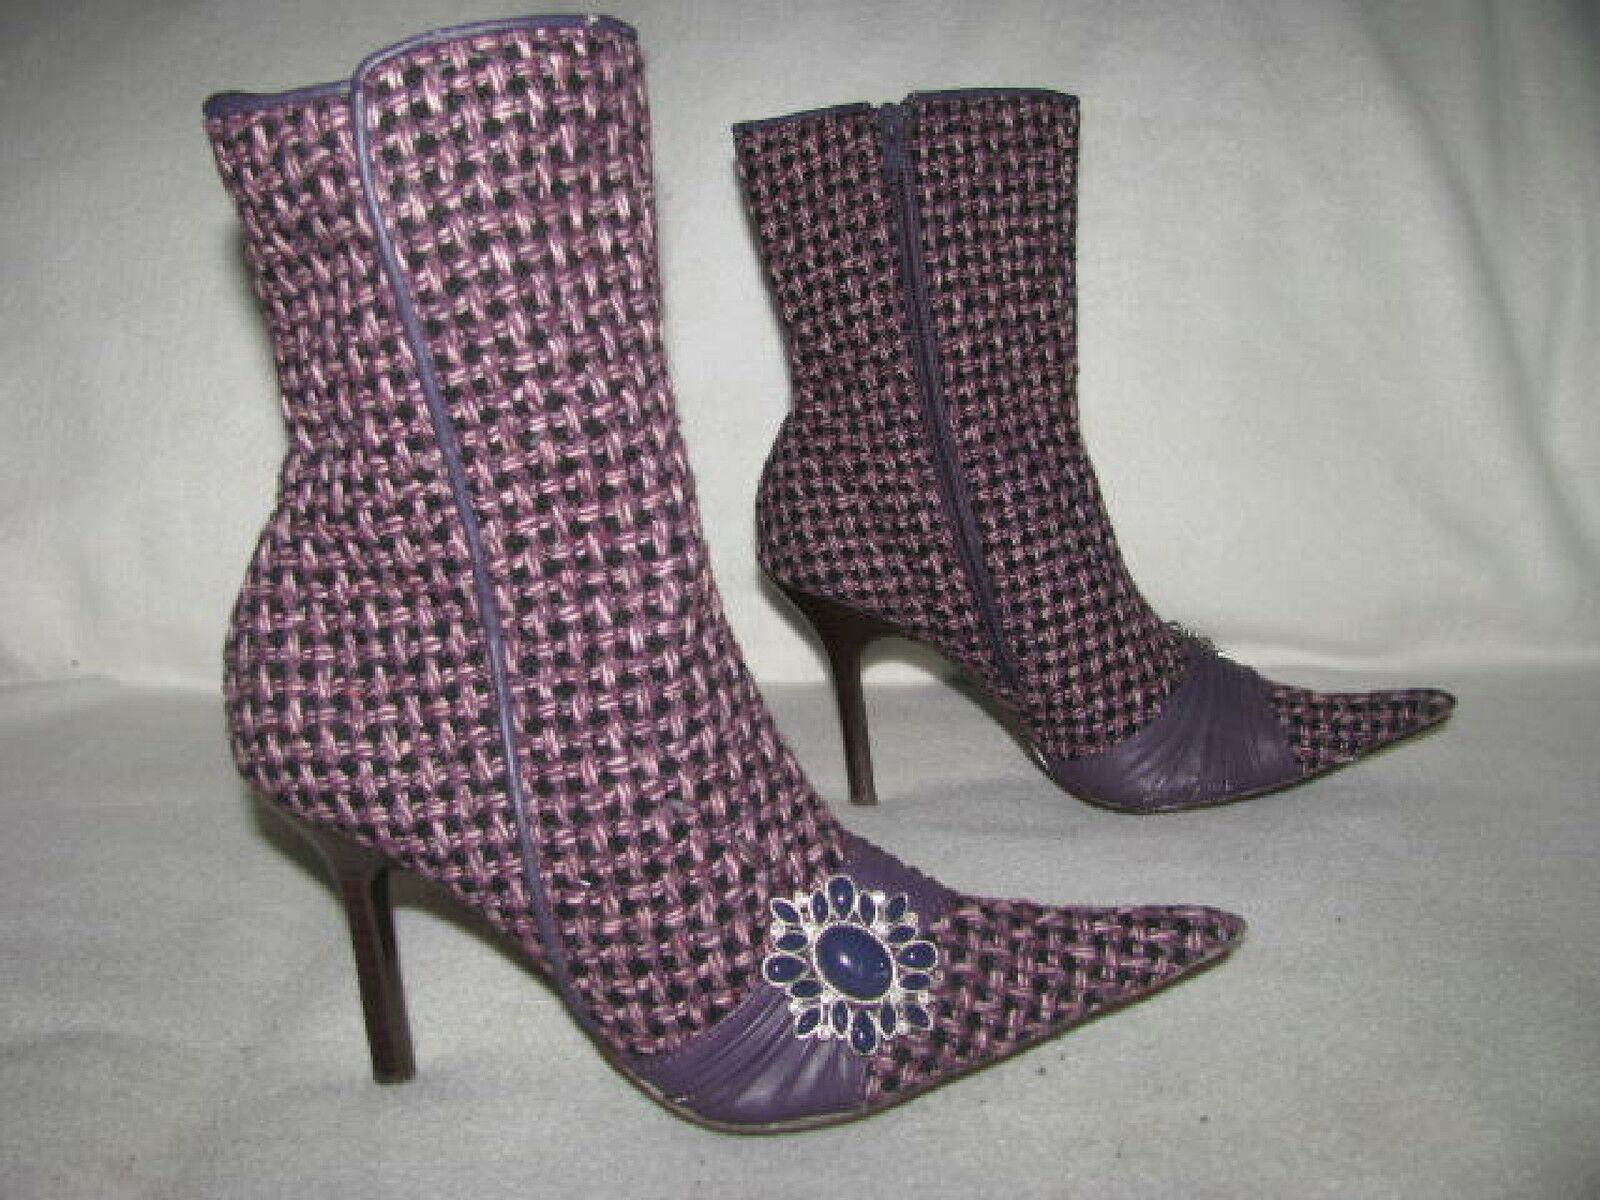 STEVE MADDEN Dynasti Purple Tweed Fashion Heel Zip Boots Fashion Pointy Toe